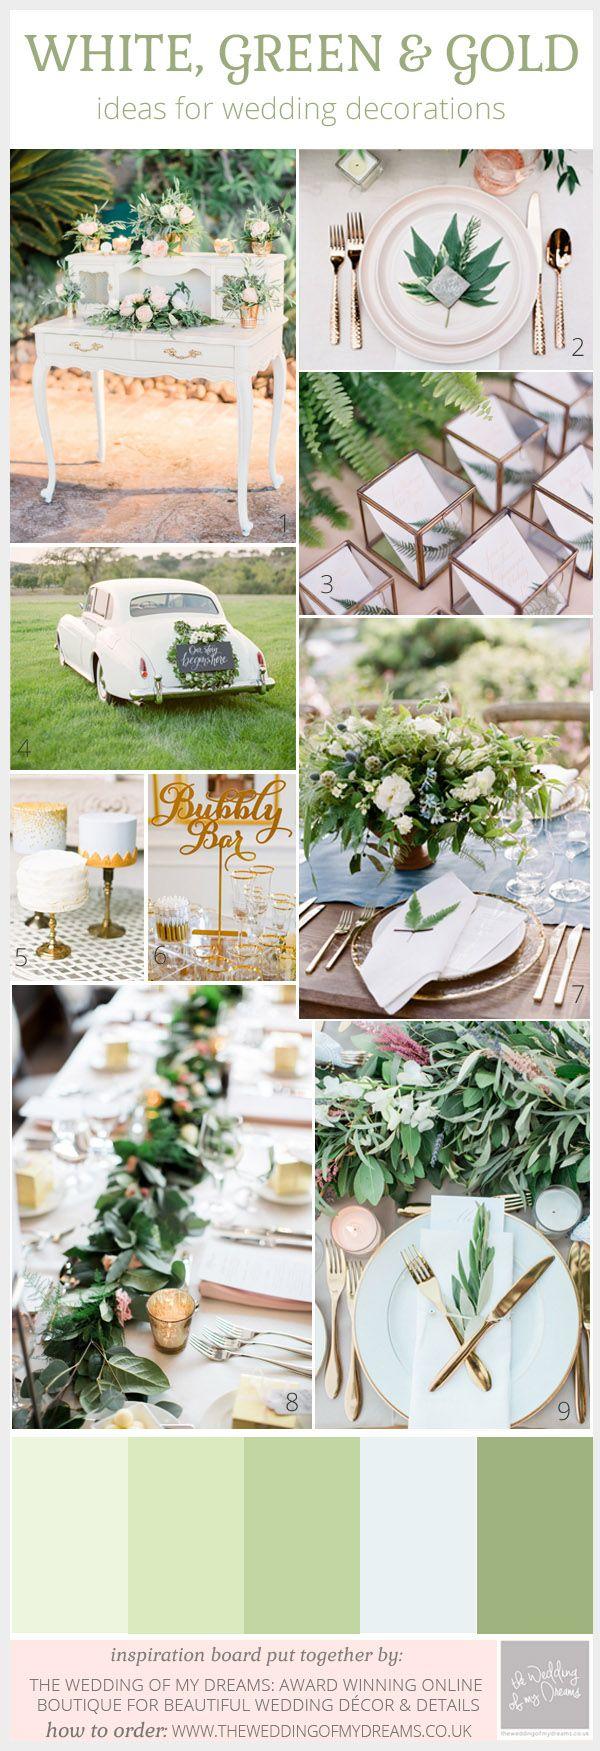 Green white and gold wedding ideas inspiration gold weddings green white and gold wedding ideas inspiration junglespirit Gallery